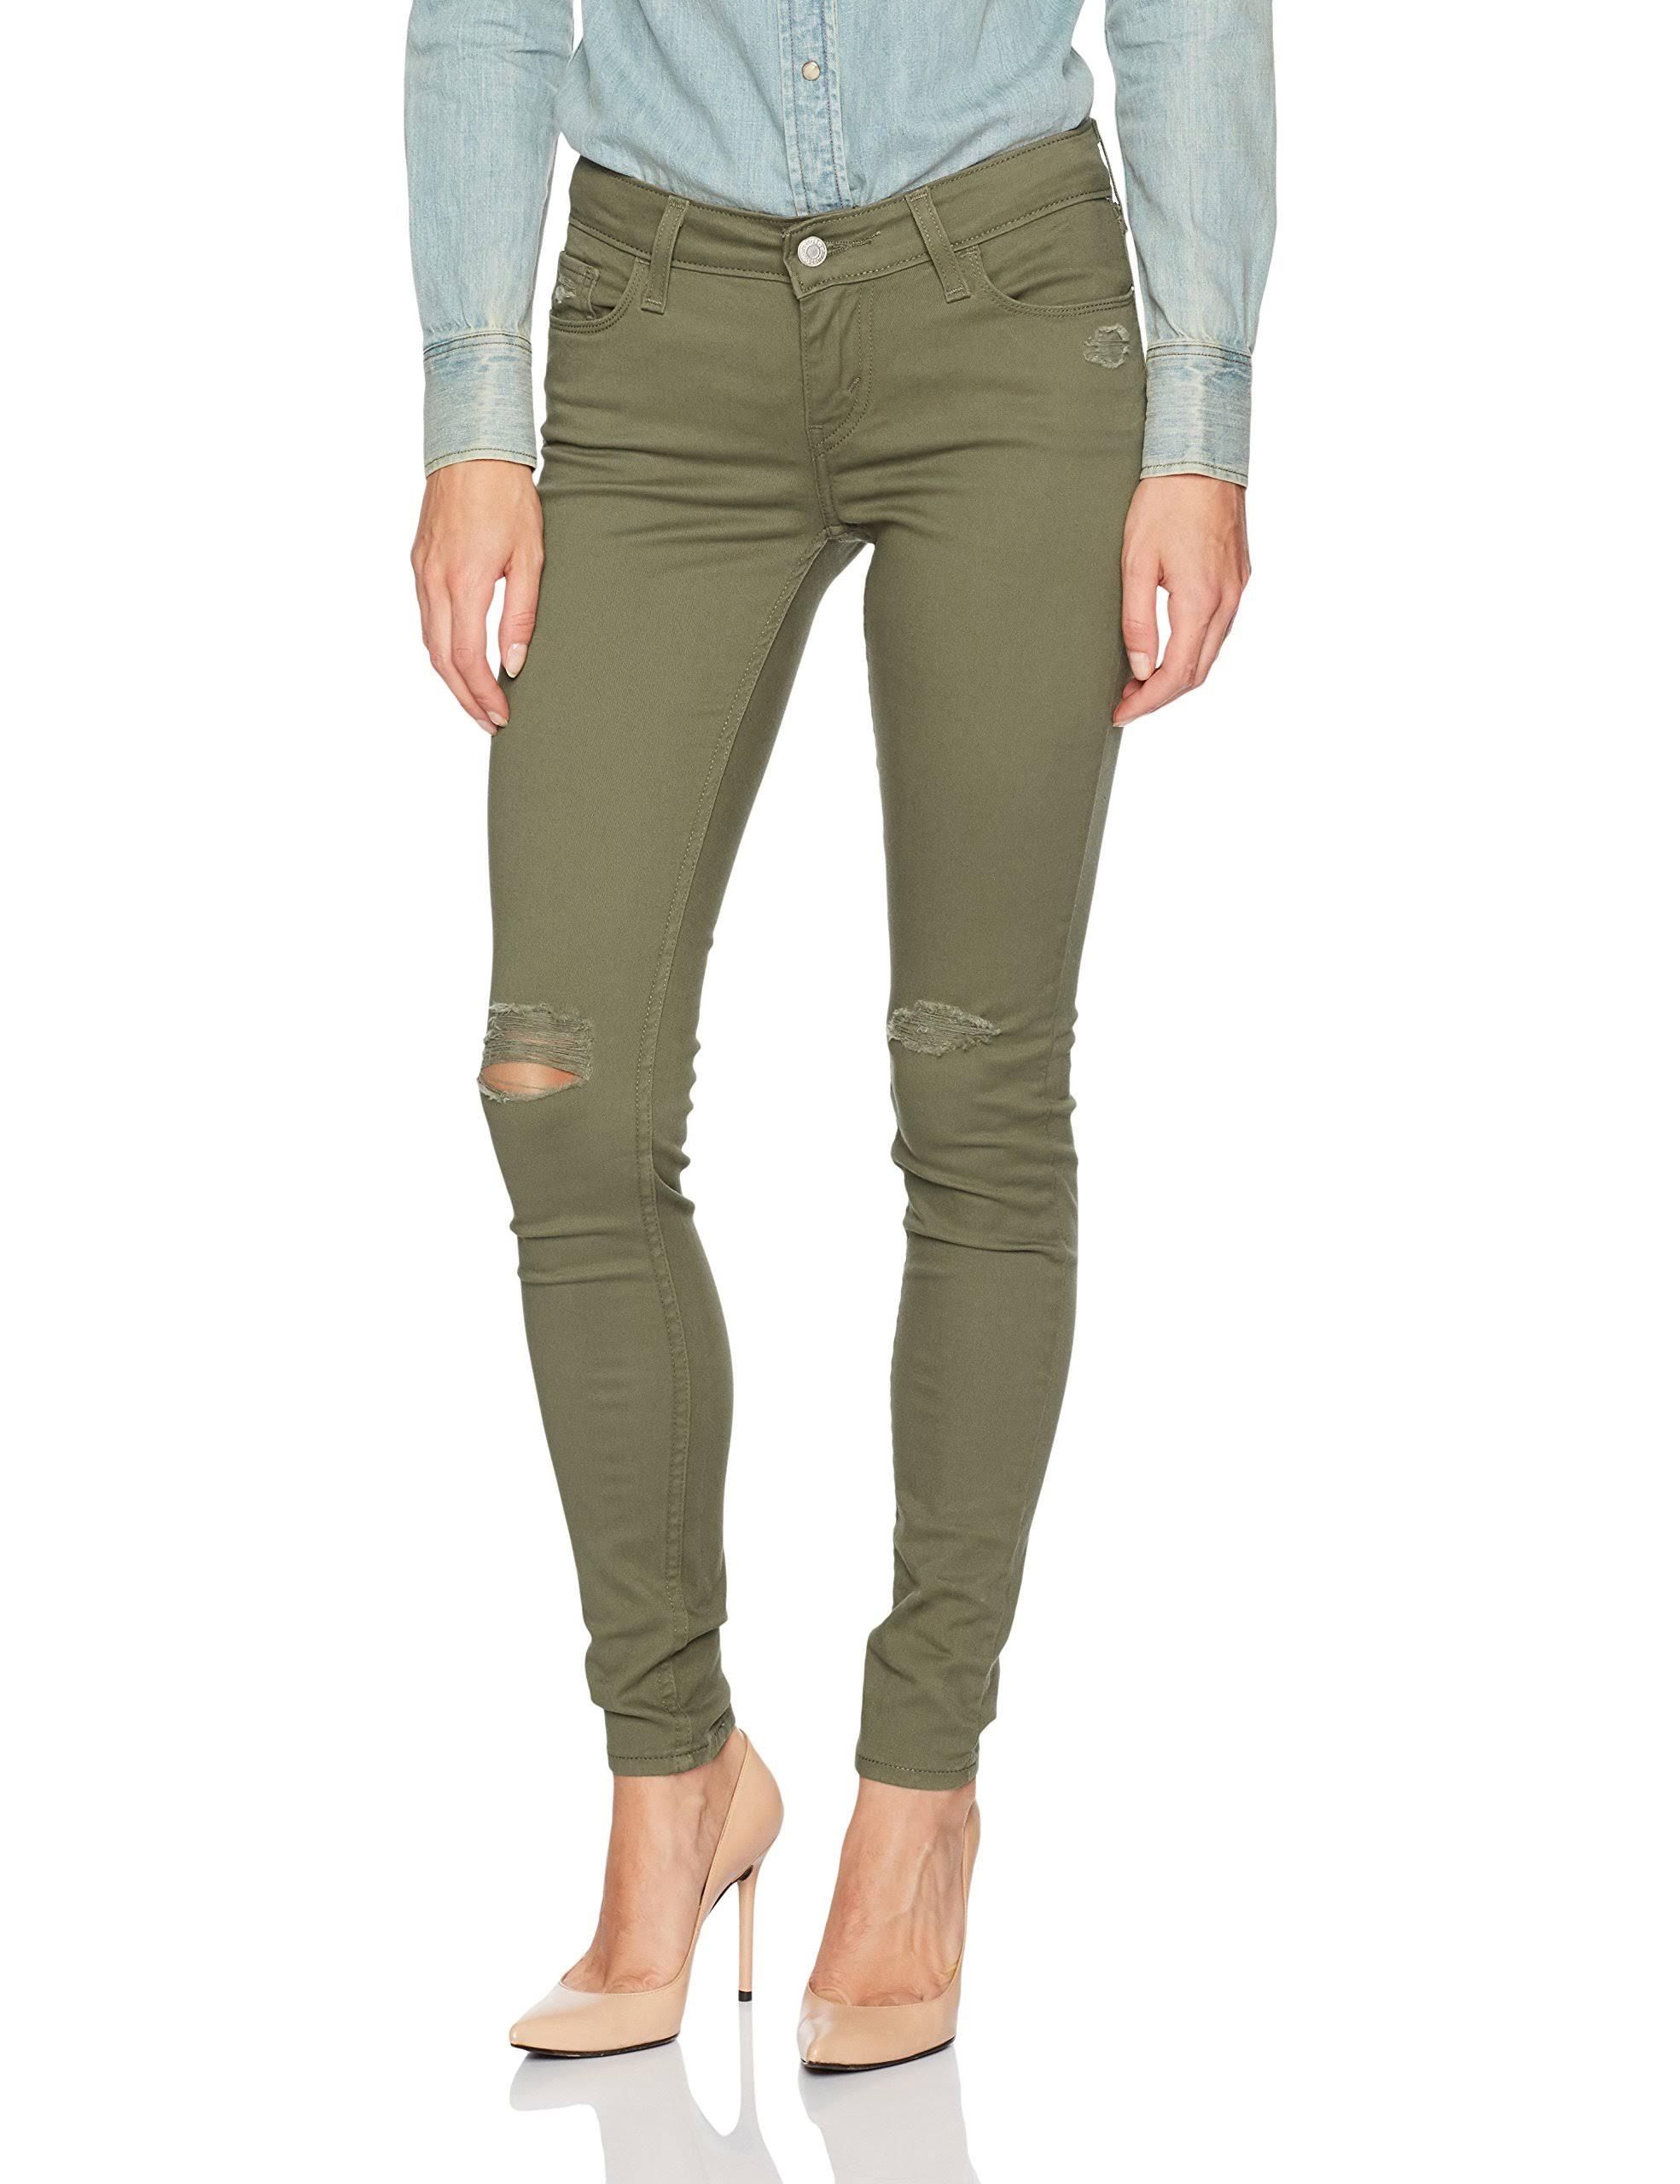 Für Super Skinny Damen 535 Jeans Levi's wvq7zCc